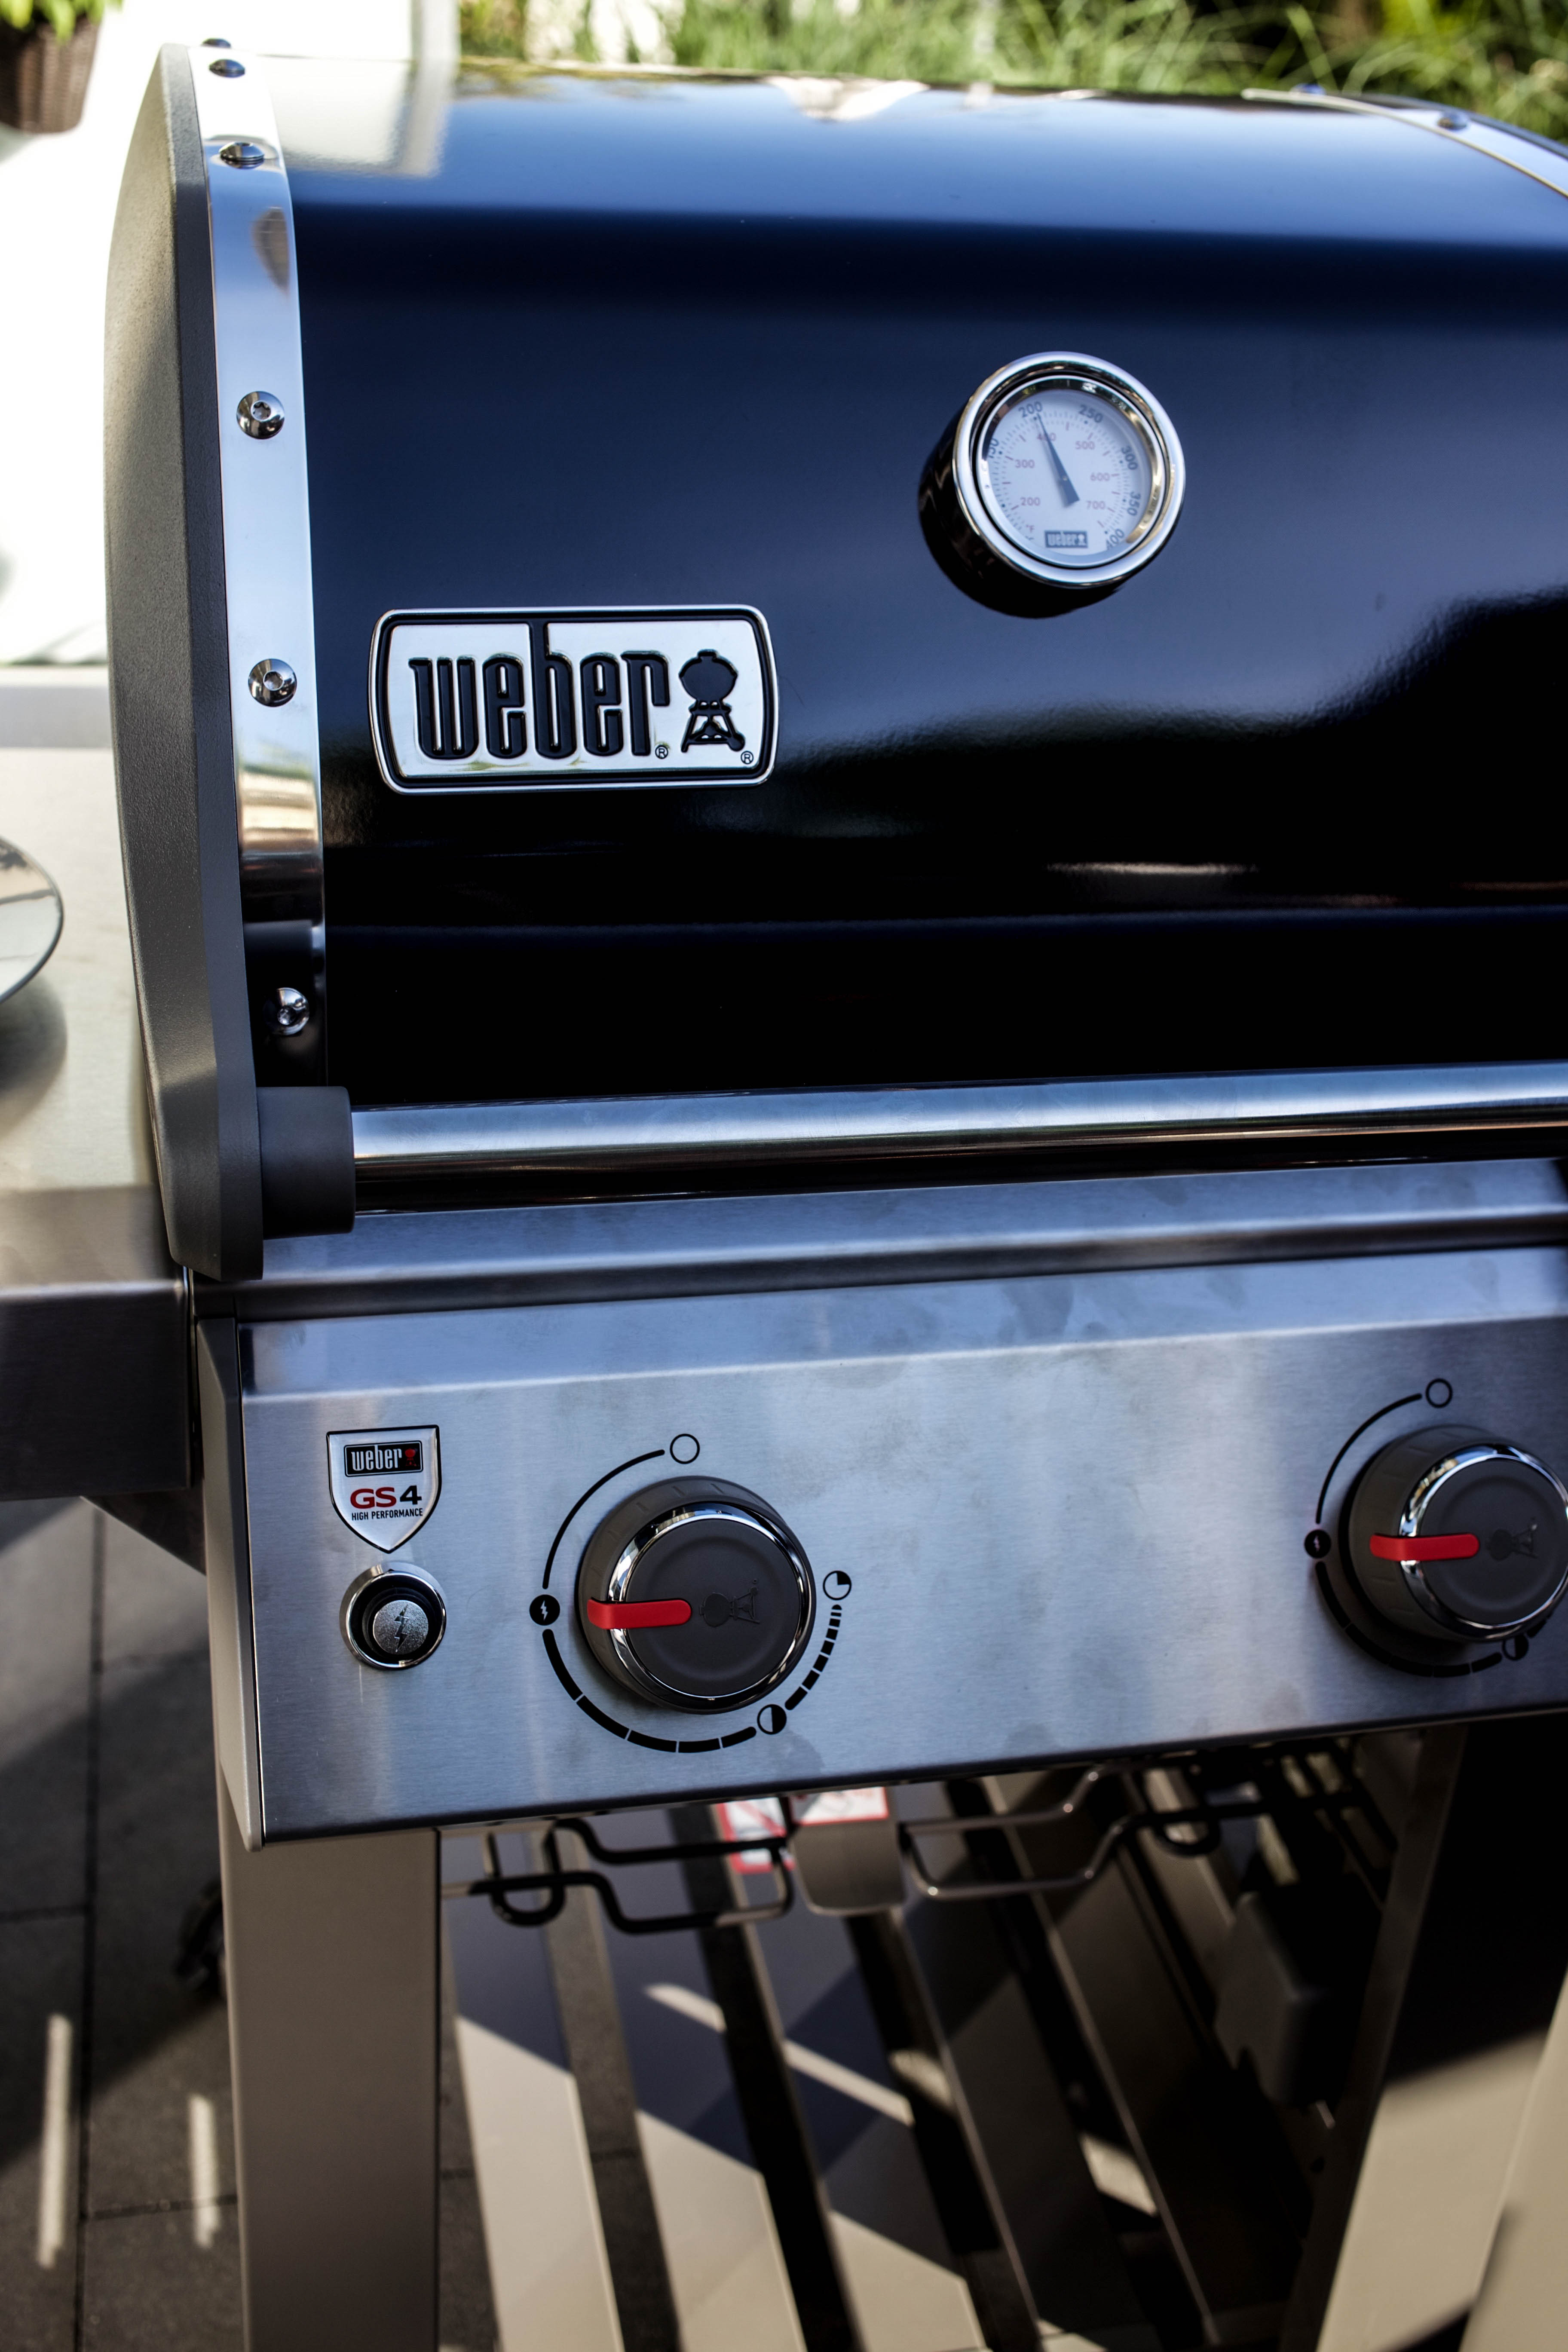 grill-abend-grillen-sommer-rezepte-ideen-tipps-weber-grill-genesis_0007